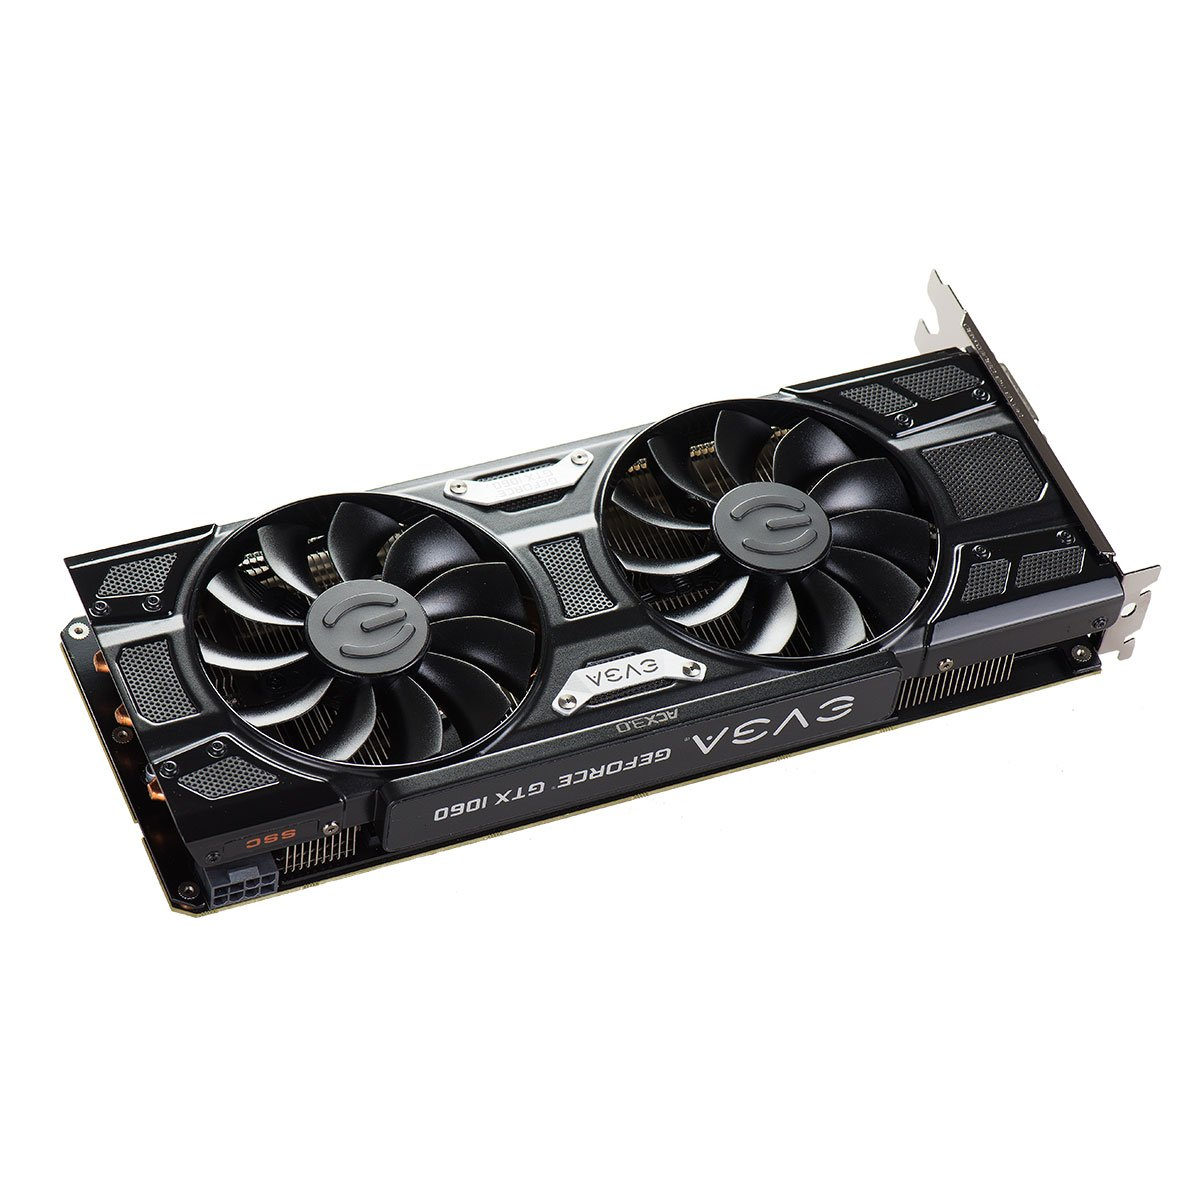 PXOC Grafikkarte  06G-P4-6163-KR DX12 OSD Support ACX 2.0 Single Fan 6GB GDDR5 EVGA GeForce GTX 1060 SC GAMING